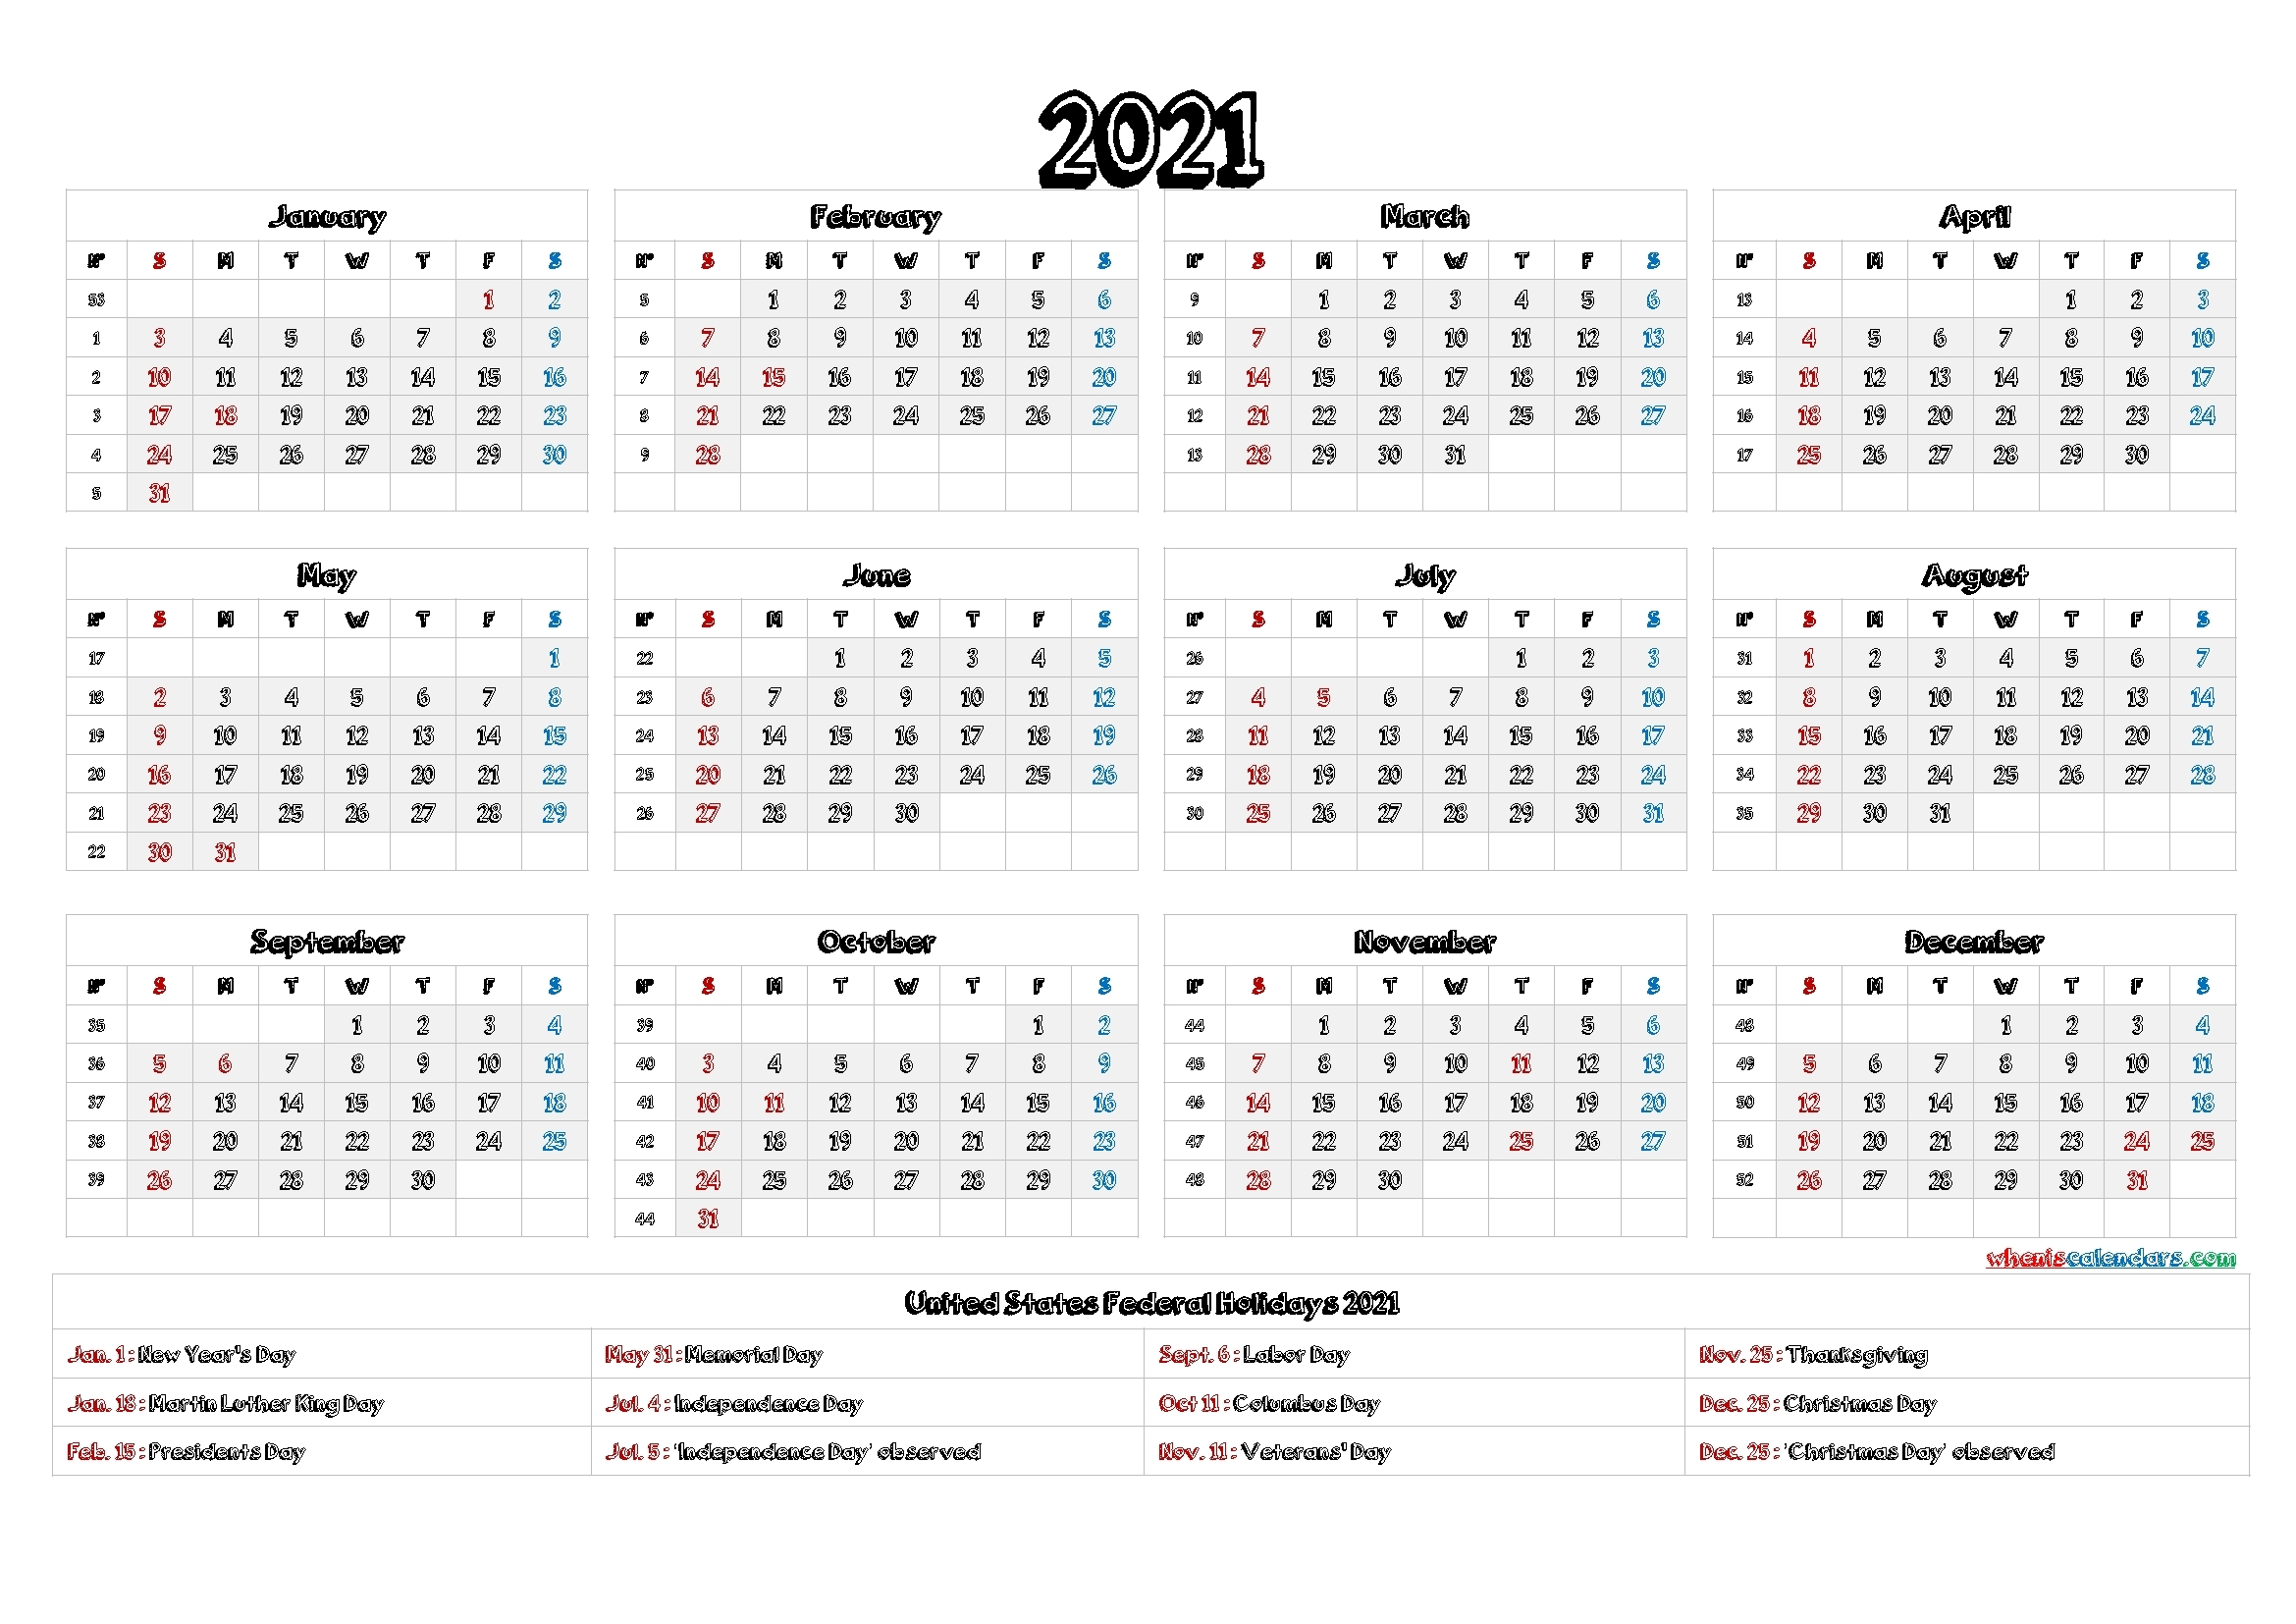 Free Printable Fill In Calendars 2021 | Calendar Template Printable pertaining to Printable Largebox Grid Calendar 2021